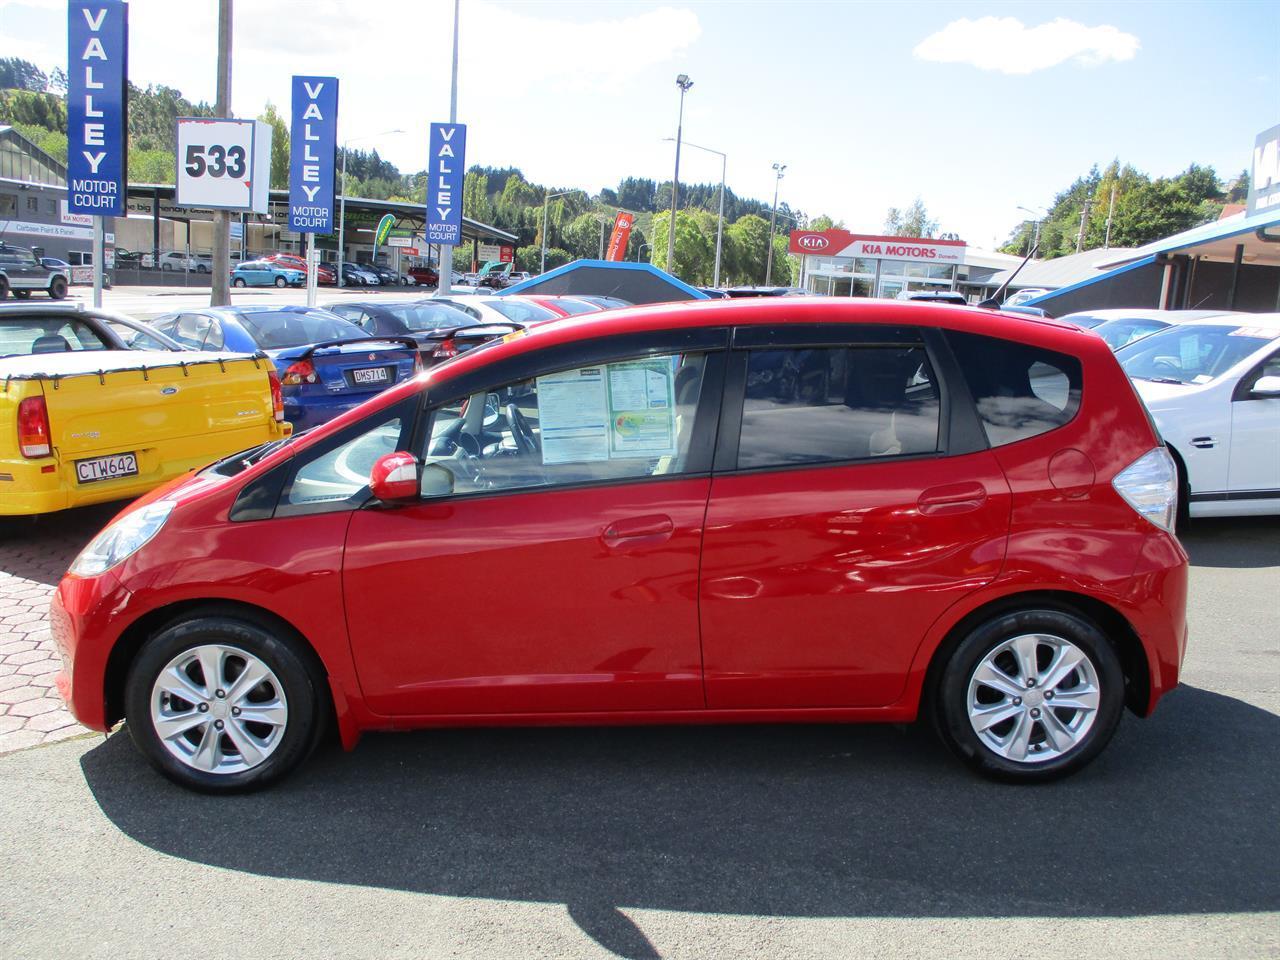 image-7, 2011 Honda Fit Hybrid at Dunedin